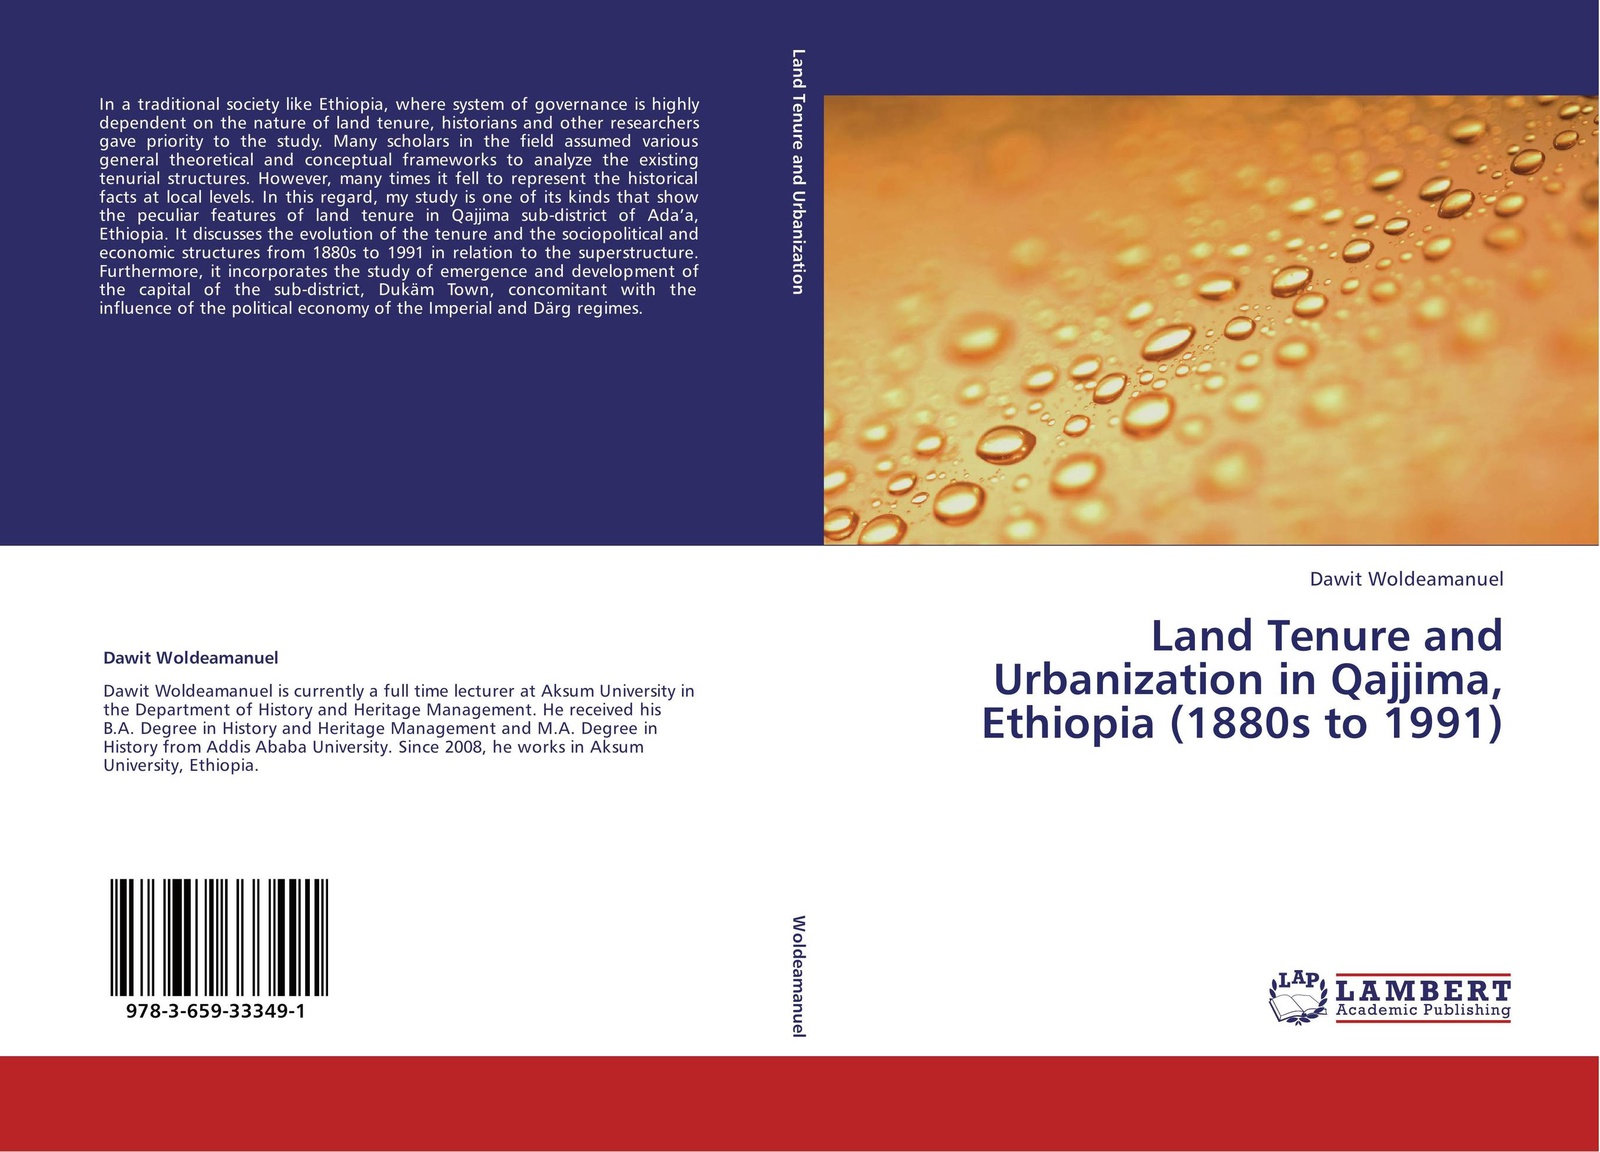 Dawit Woldeamanuel Land Tenure and Urbanization in Qajjima, Ethiopia (1880s to 1991) недорго, оригинальная цена